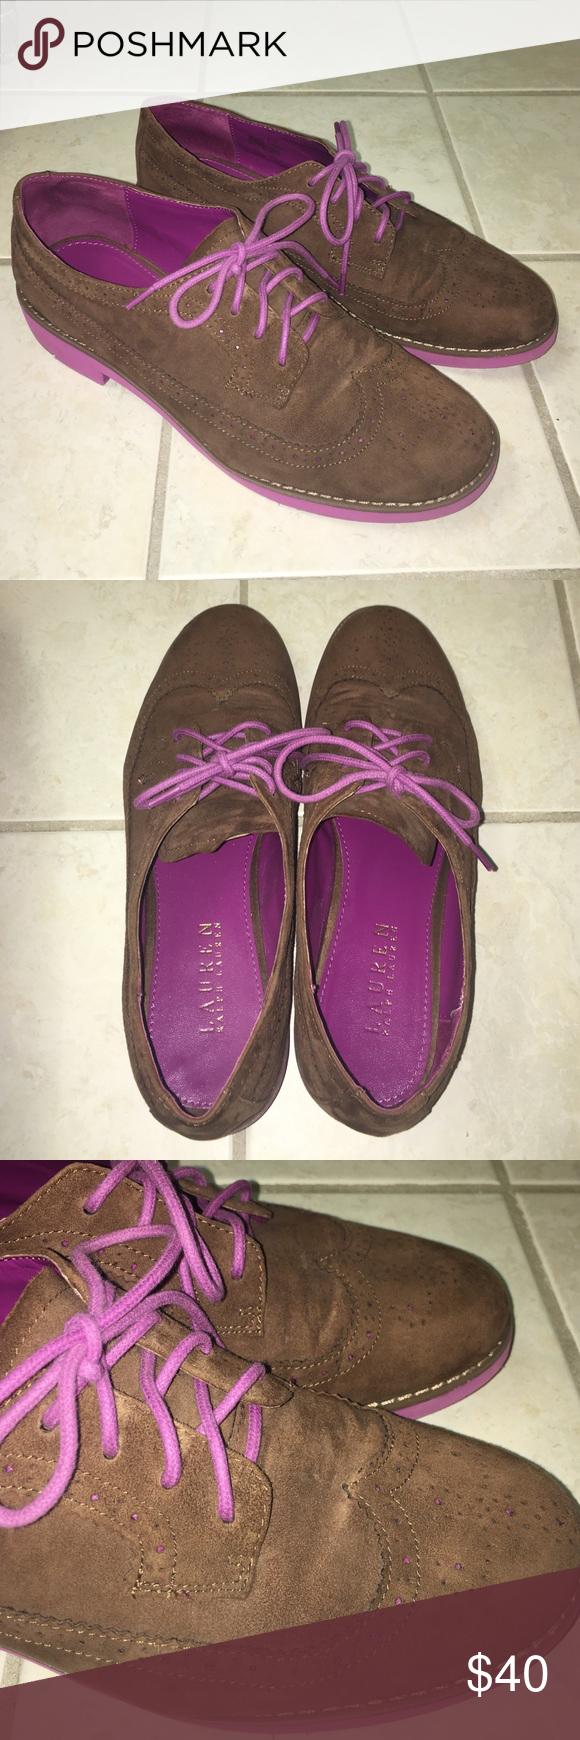 Lauren Ralph Lauren Shoes | Ralph lauren shoes, Ralph